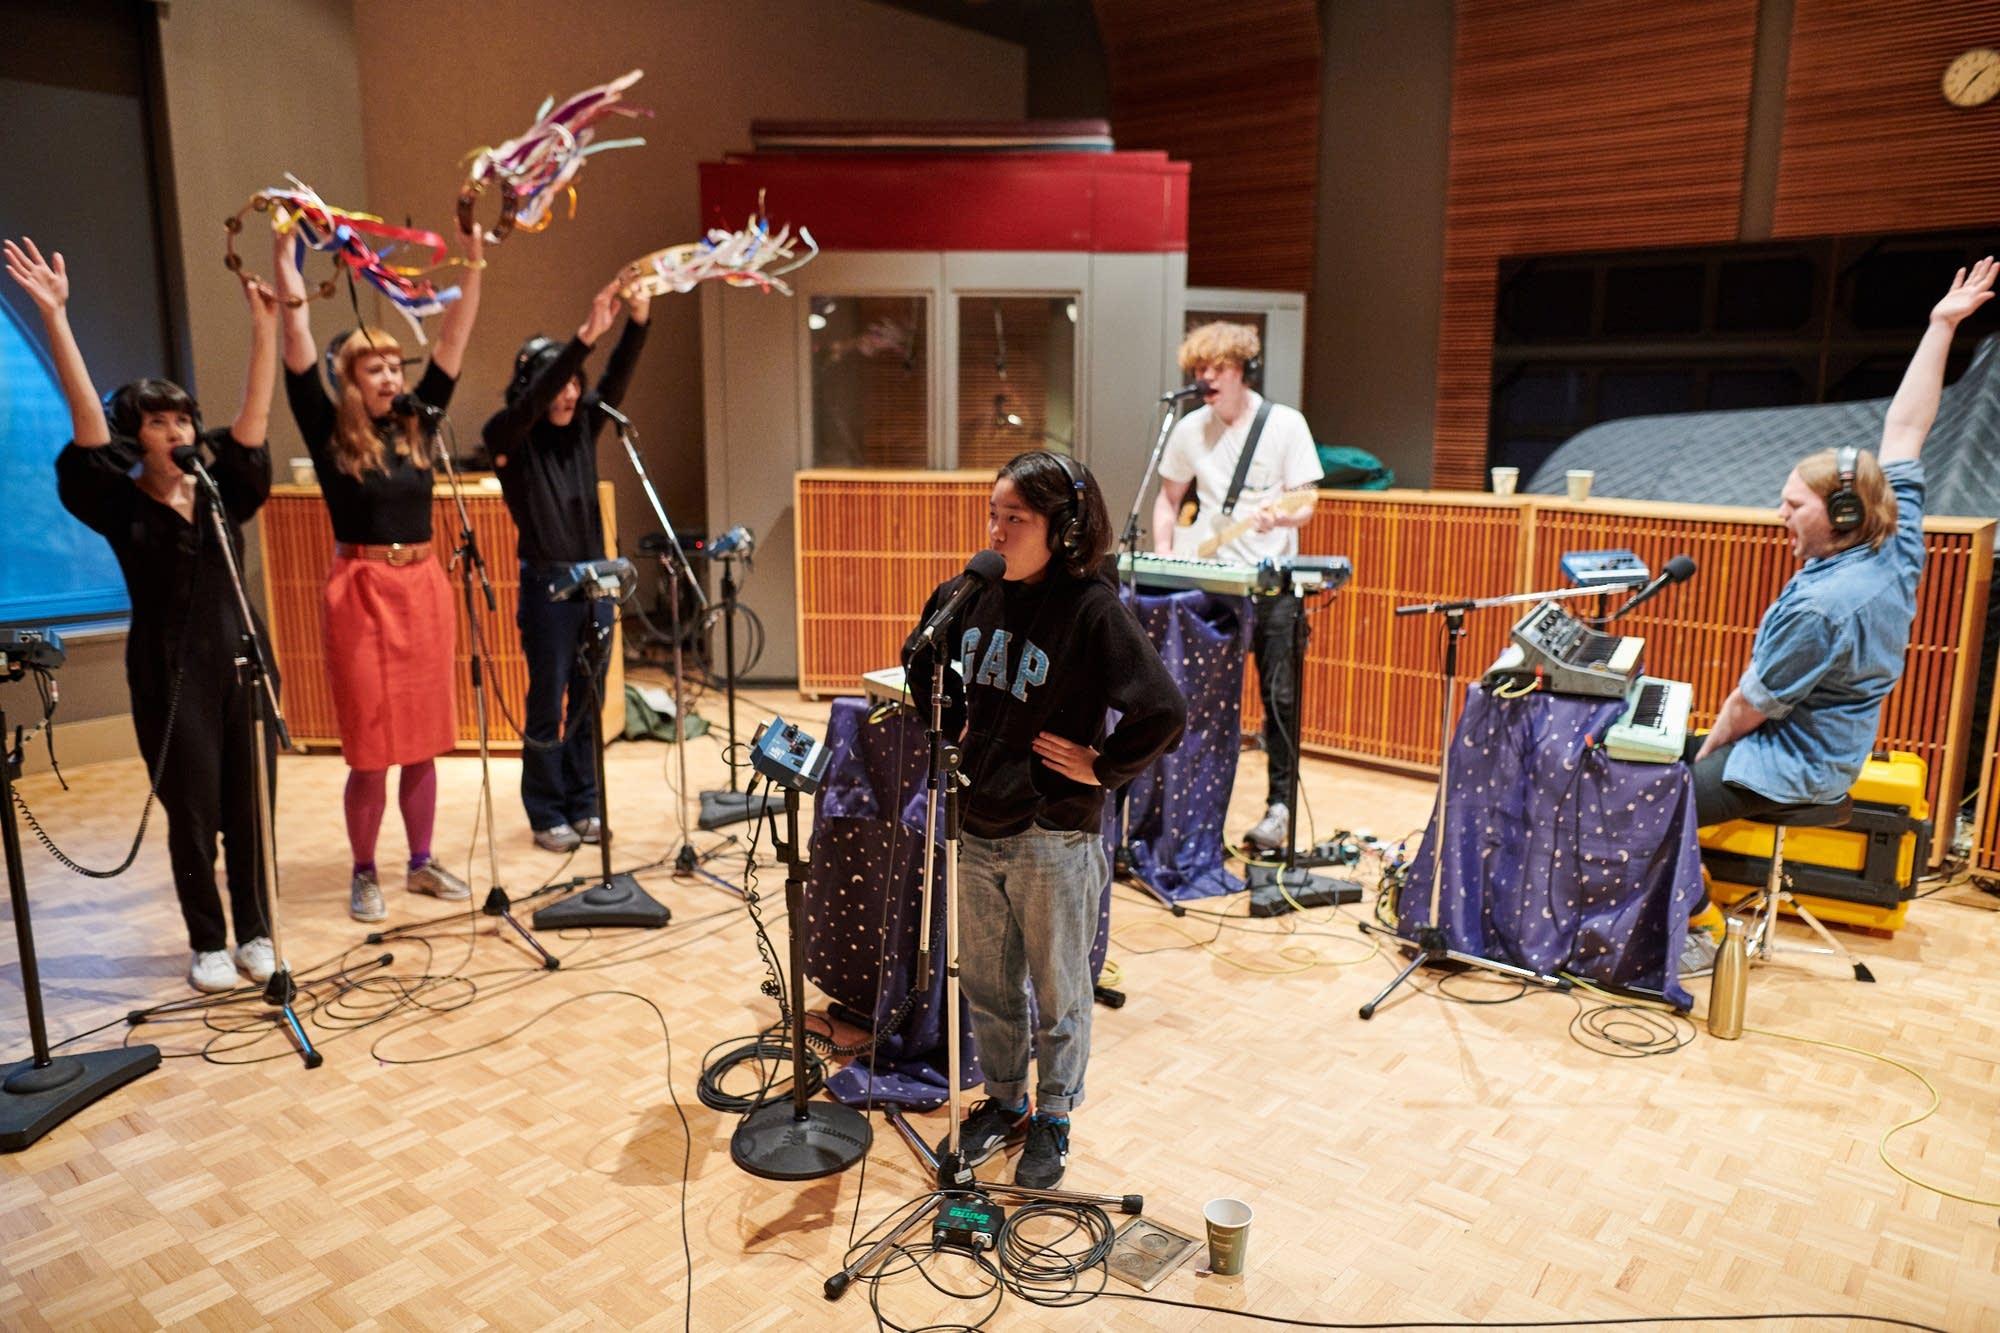 Superorganism perform in The Current studio